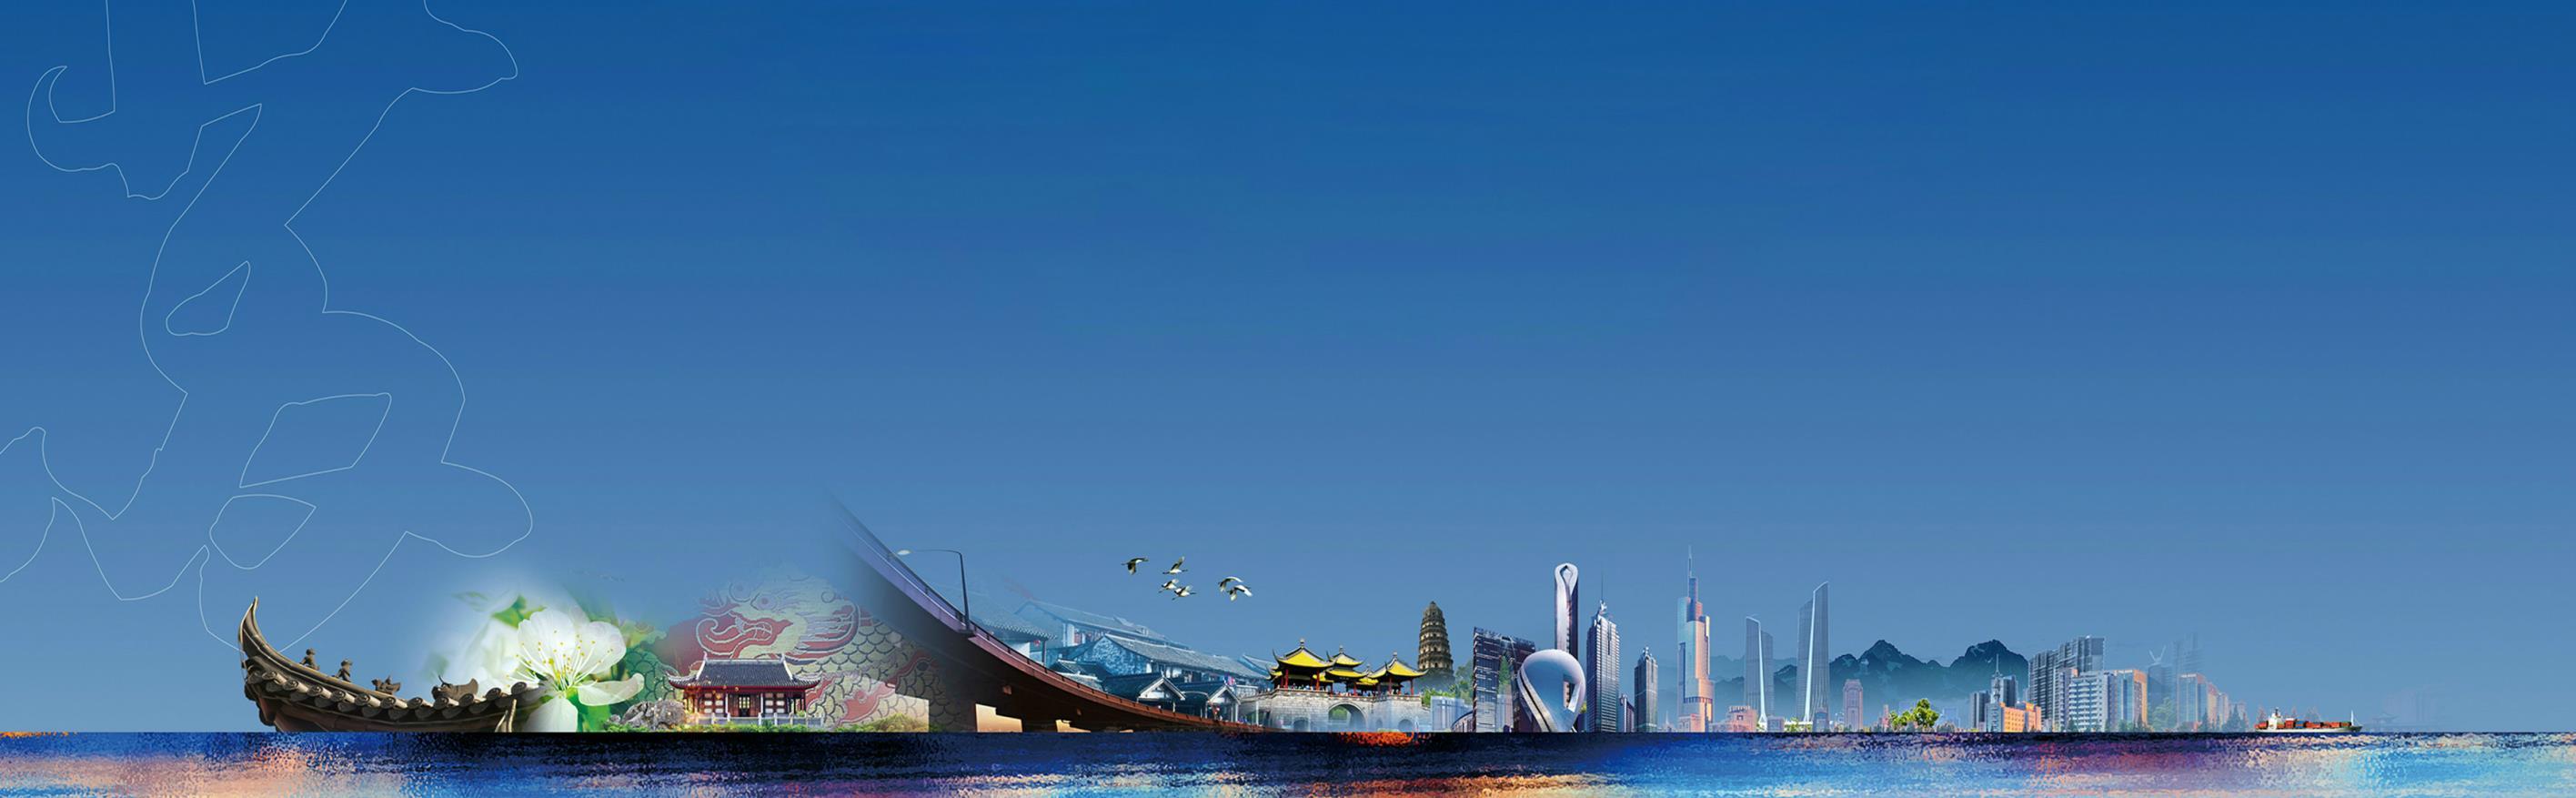 Jiangsu Export Online Fair 2021  Ships and Peripheral Equipment